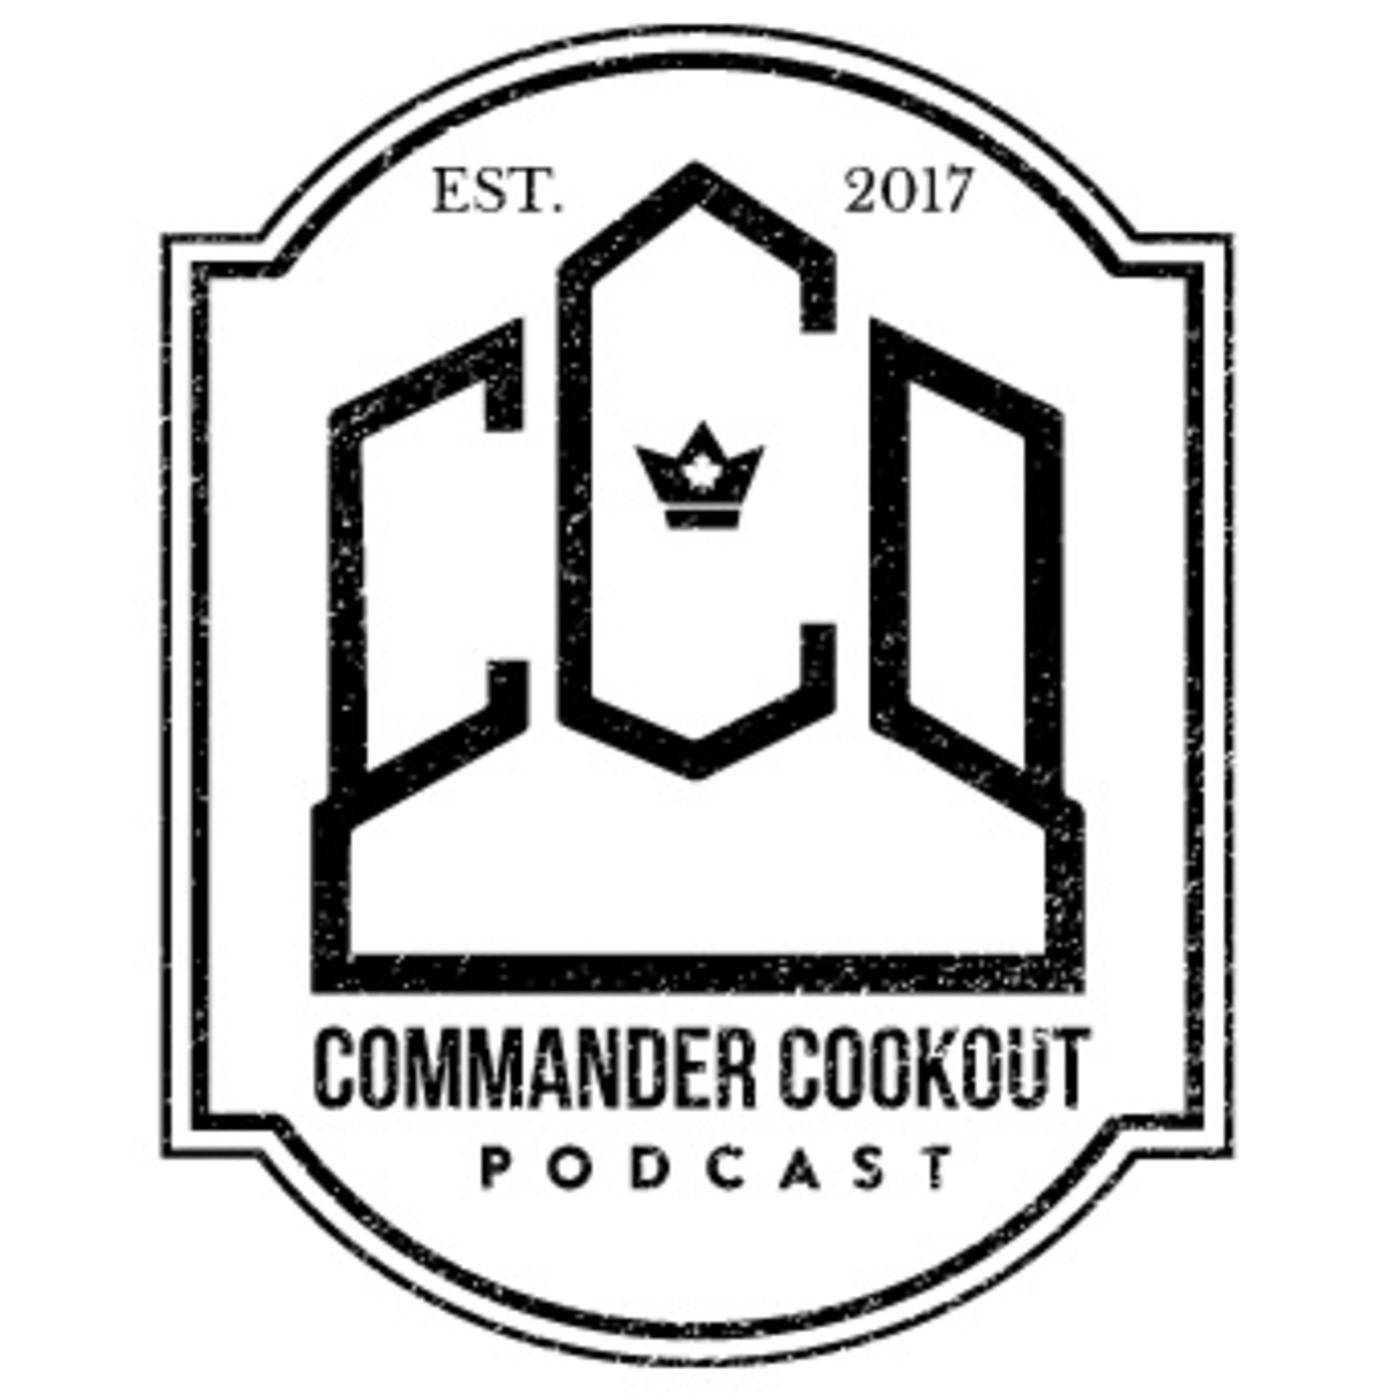 Commander Cookout Podcast | Podbay